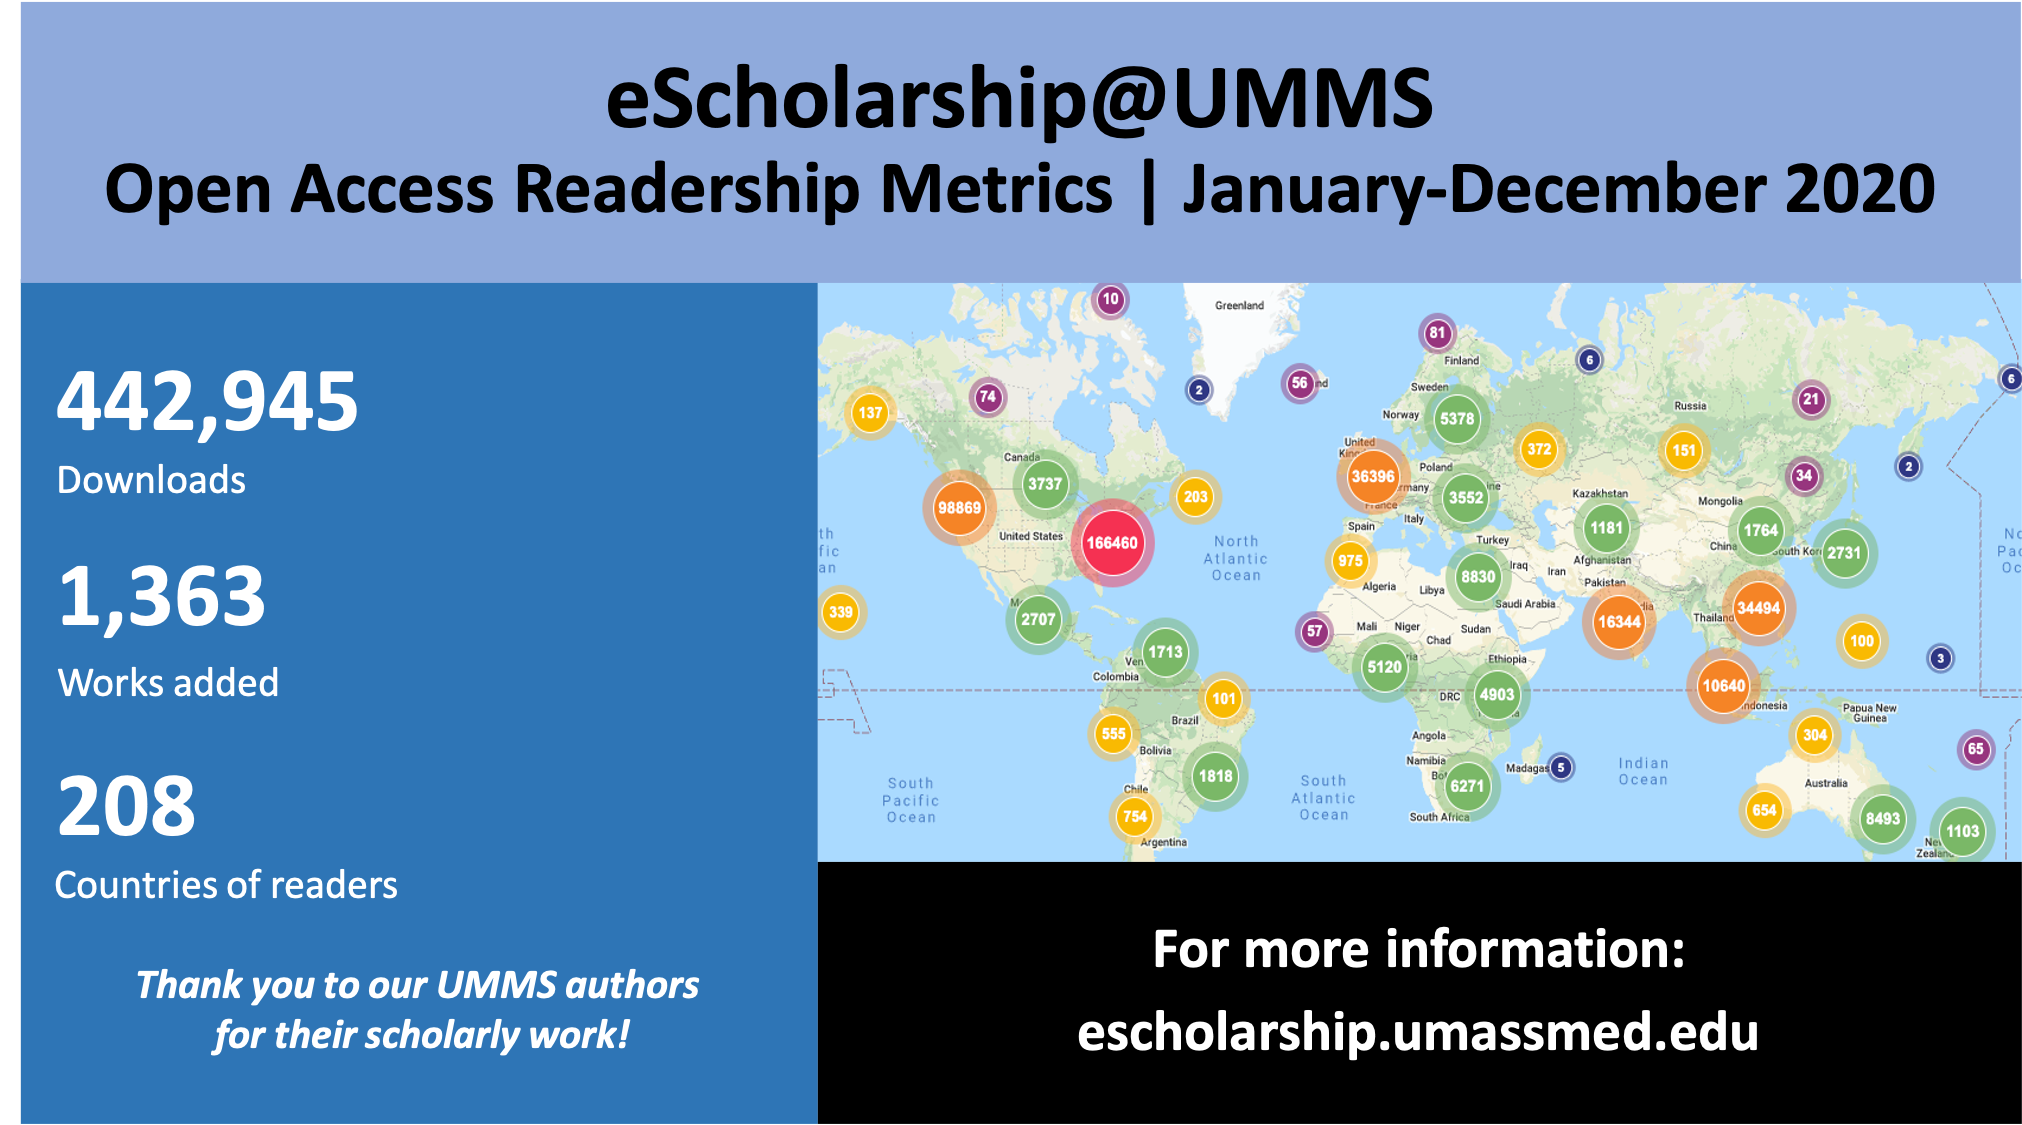 eScholarship@UMMS Annual Report 2020